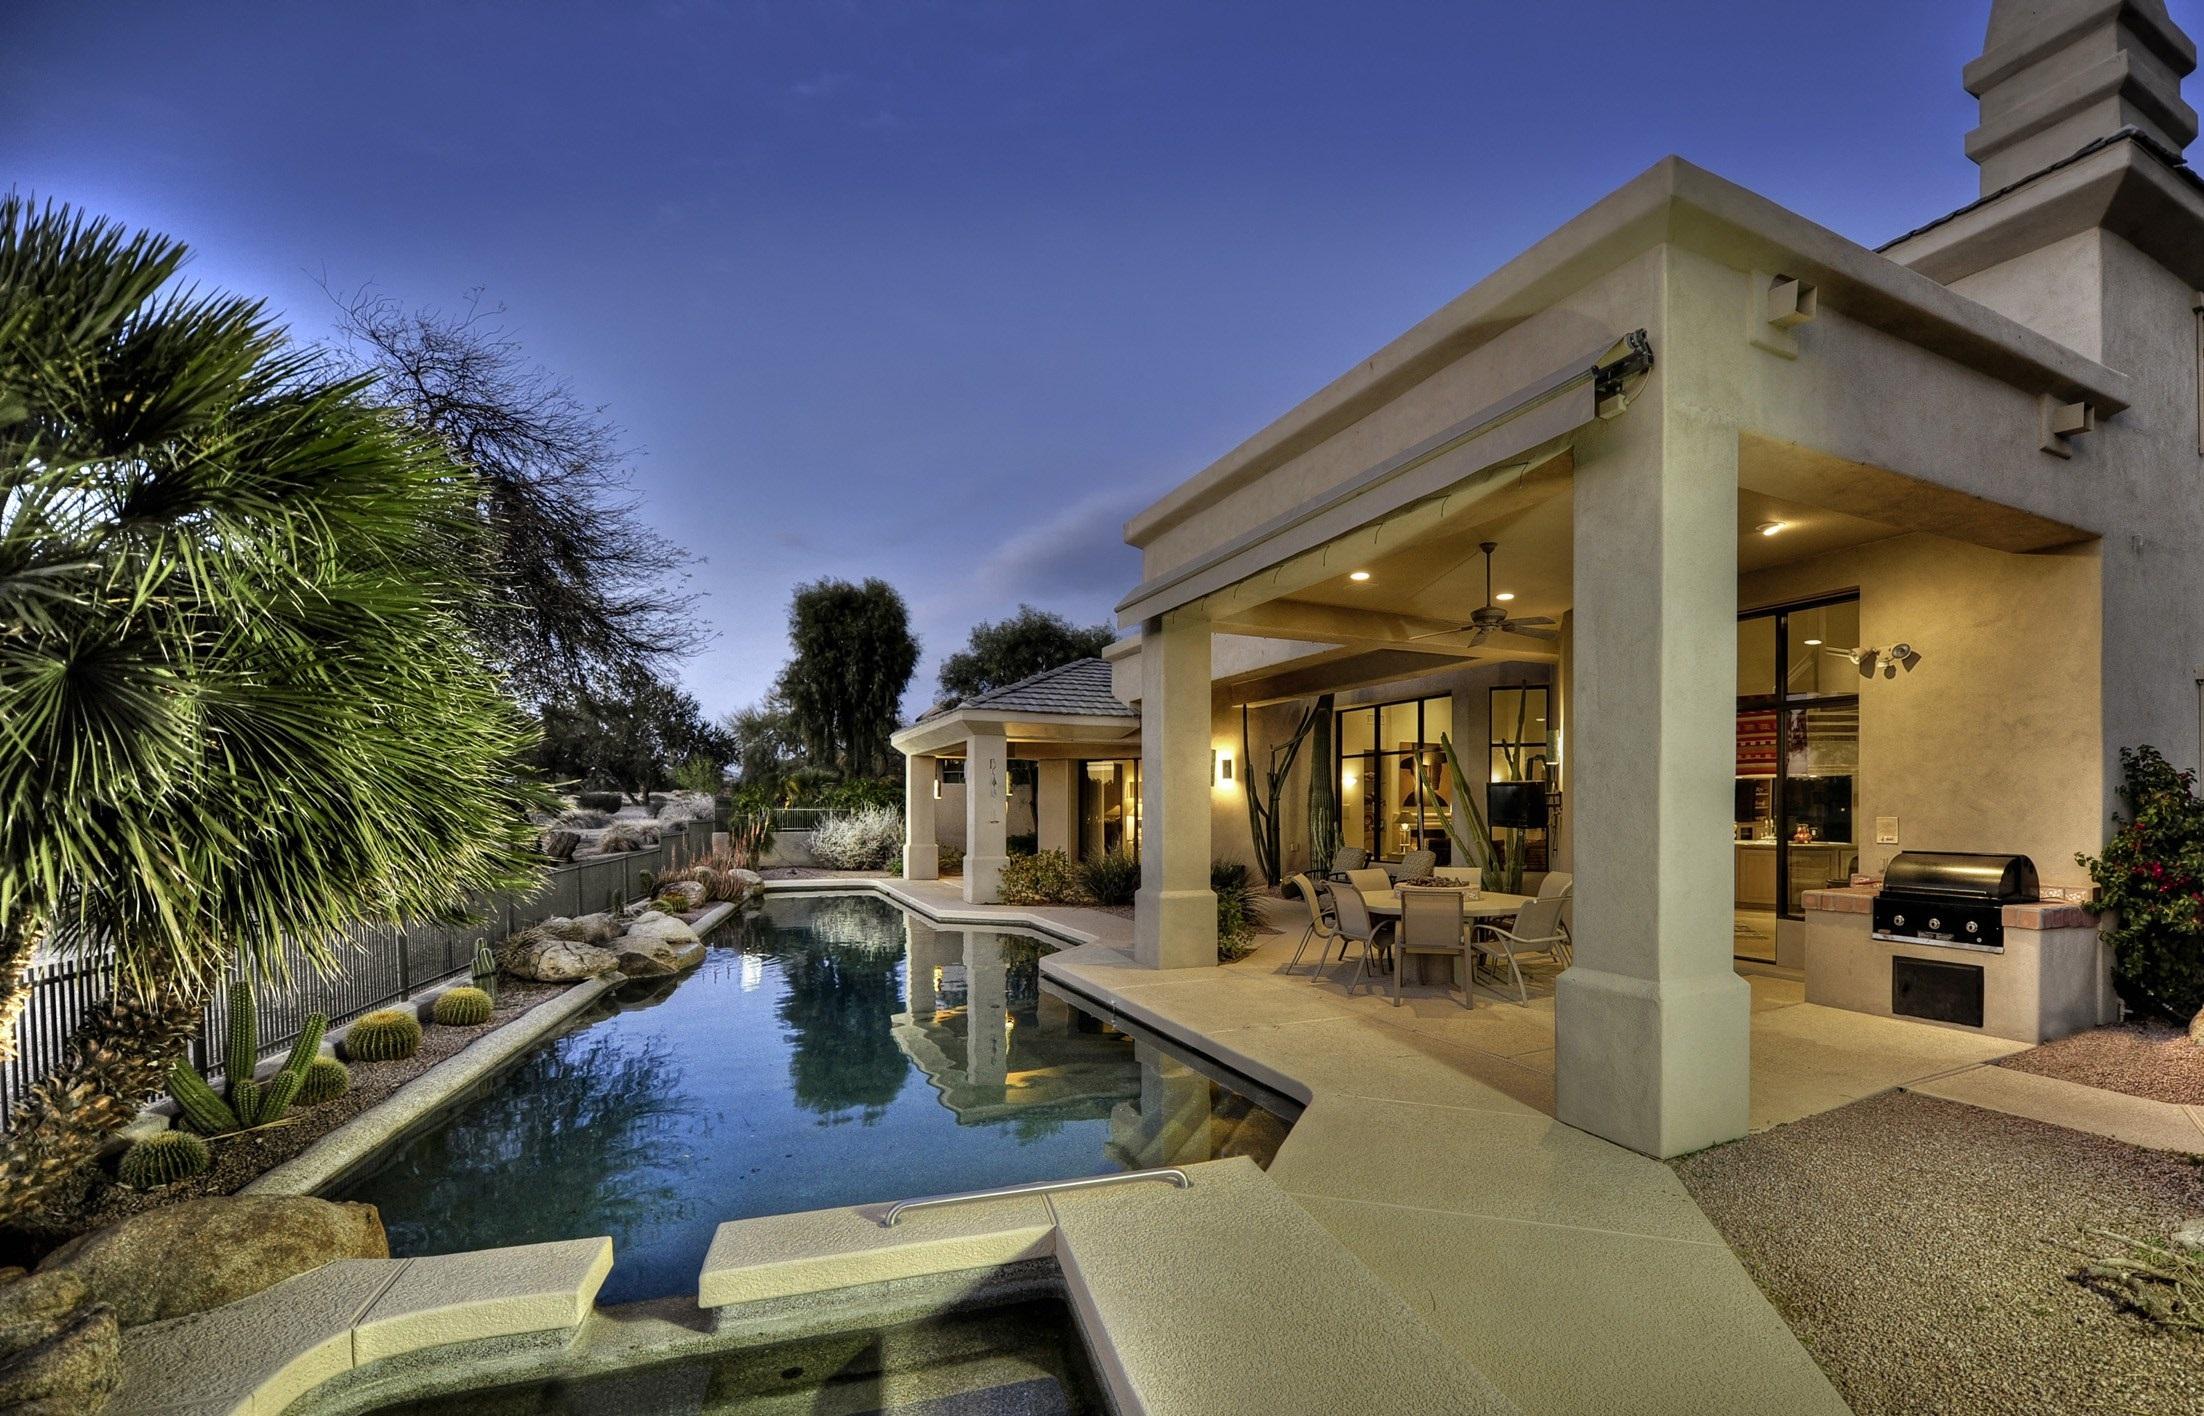 Scottsdale real estate homes for sale in Scottsdale